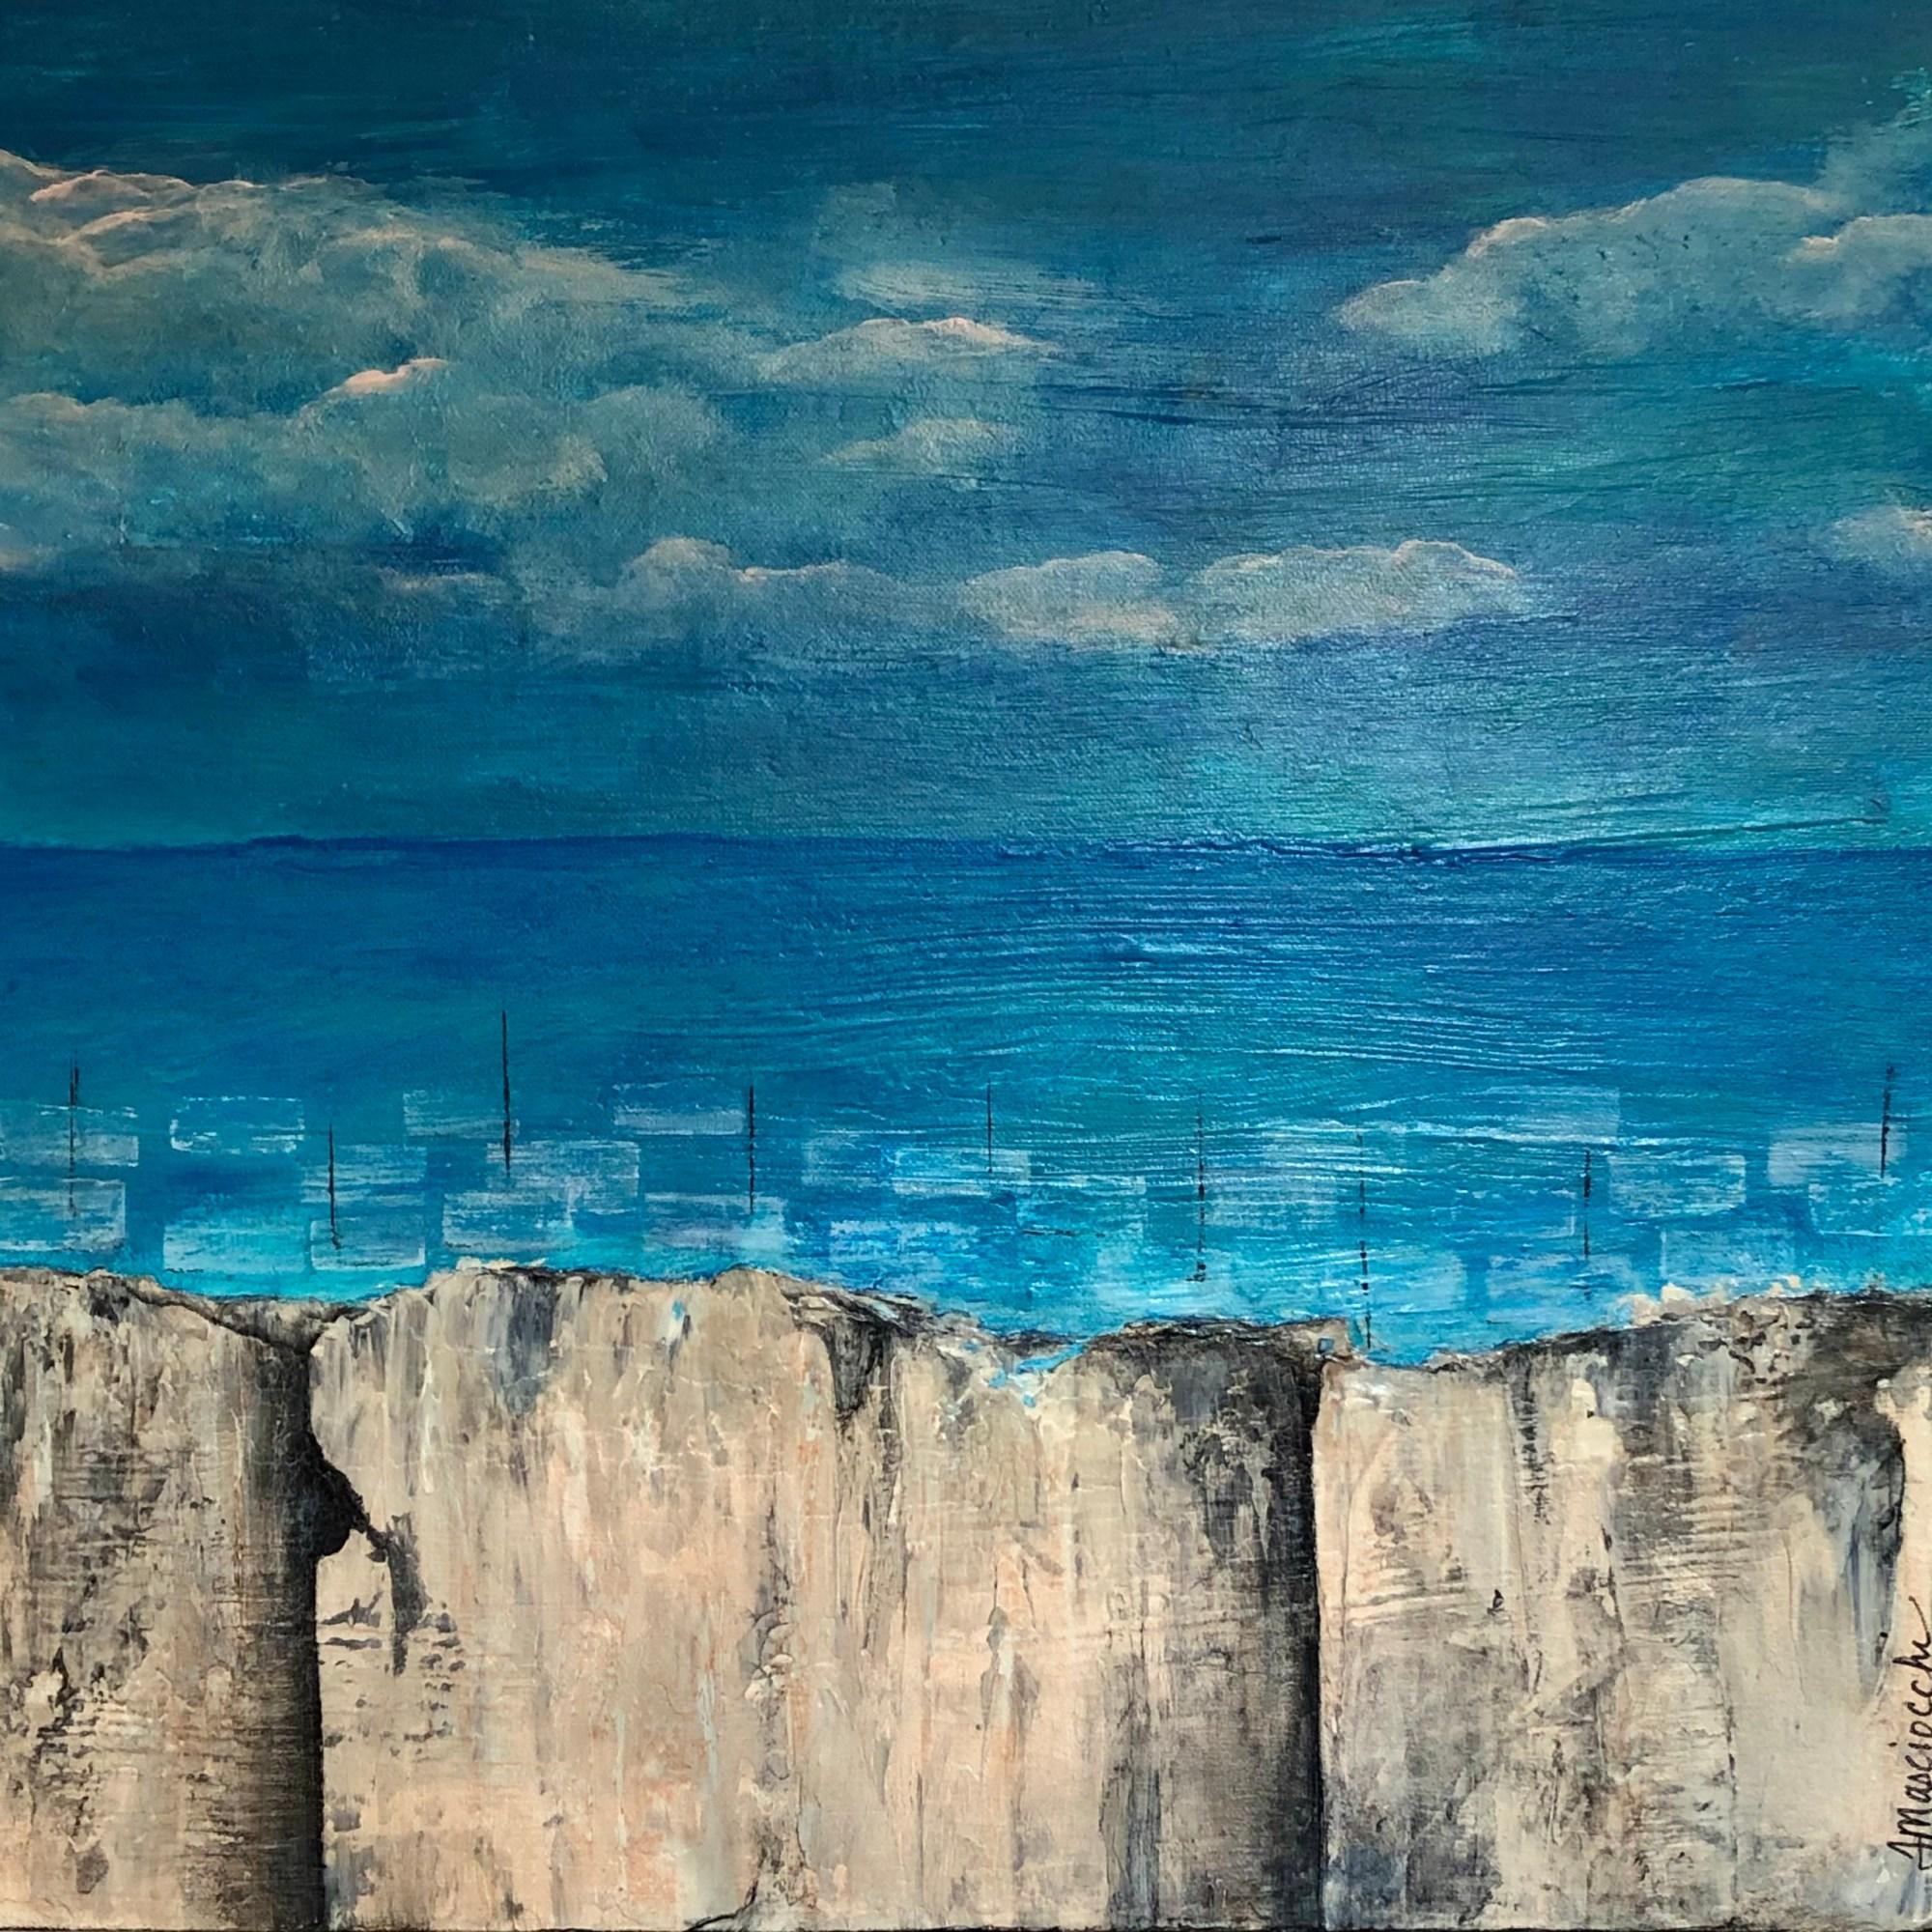 Isolation - Tina Masciocchi